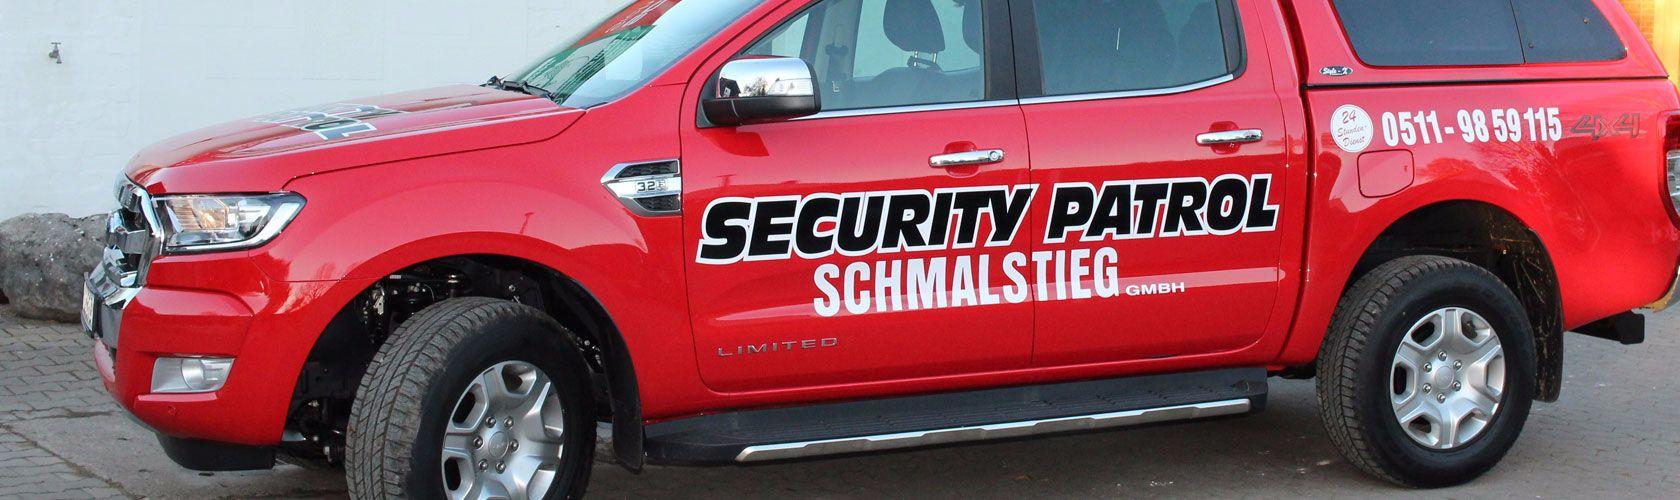 Security Patrol Hannover Region